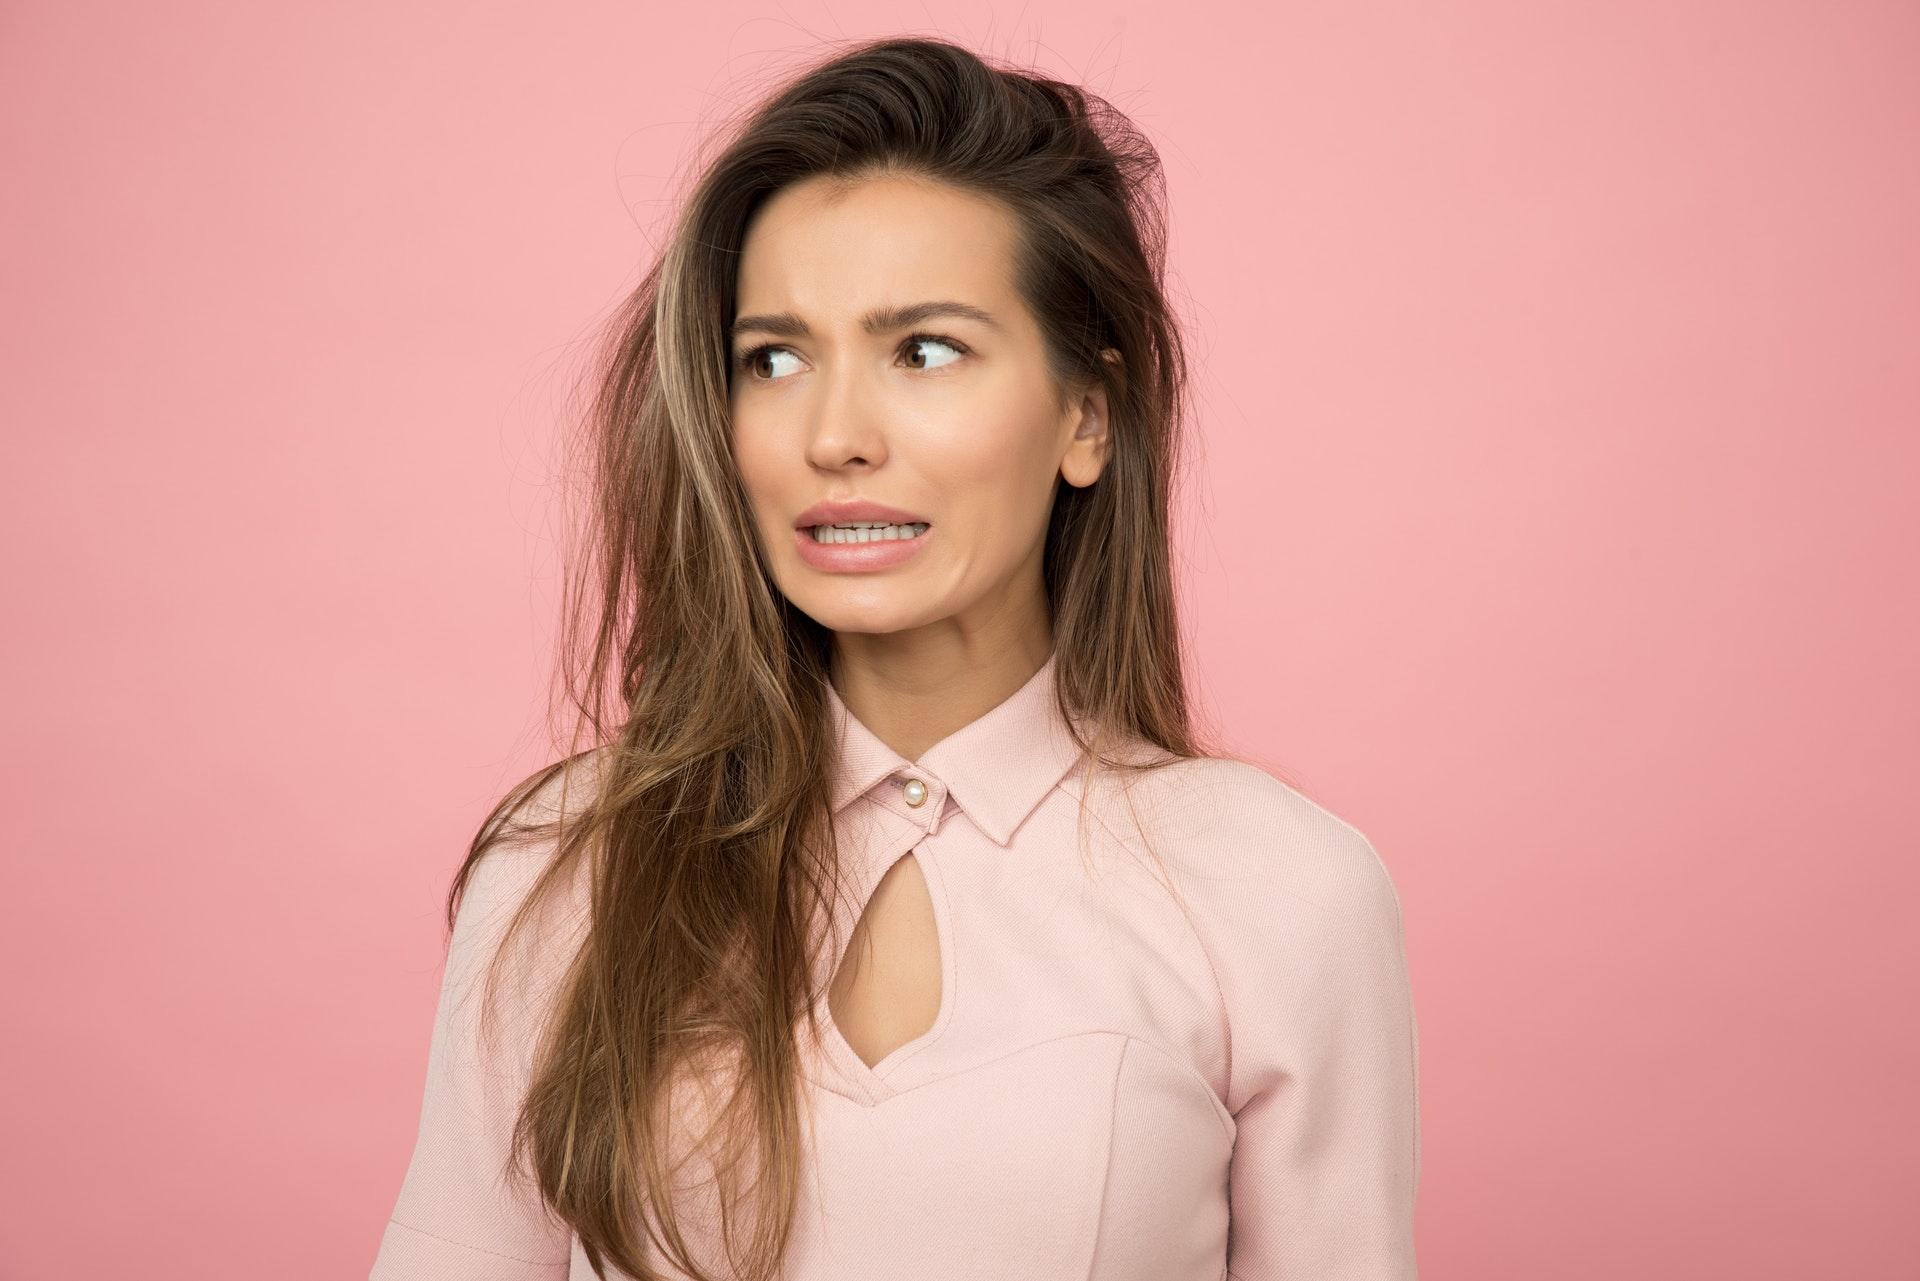 woman-wearing-pink-top-1036620